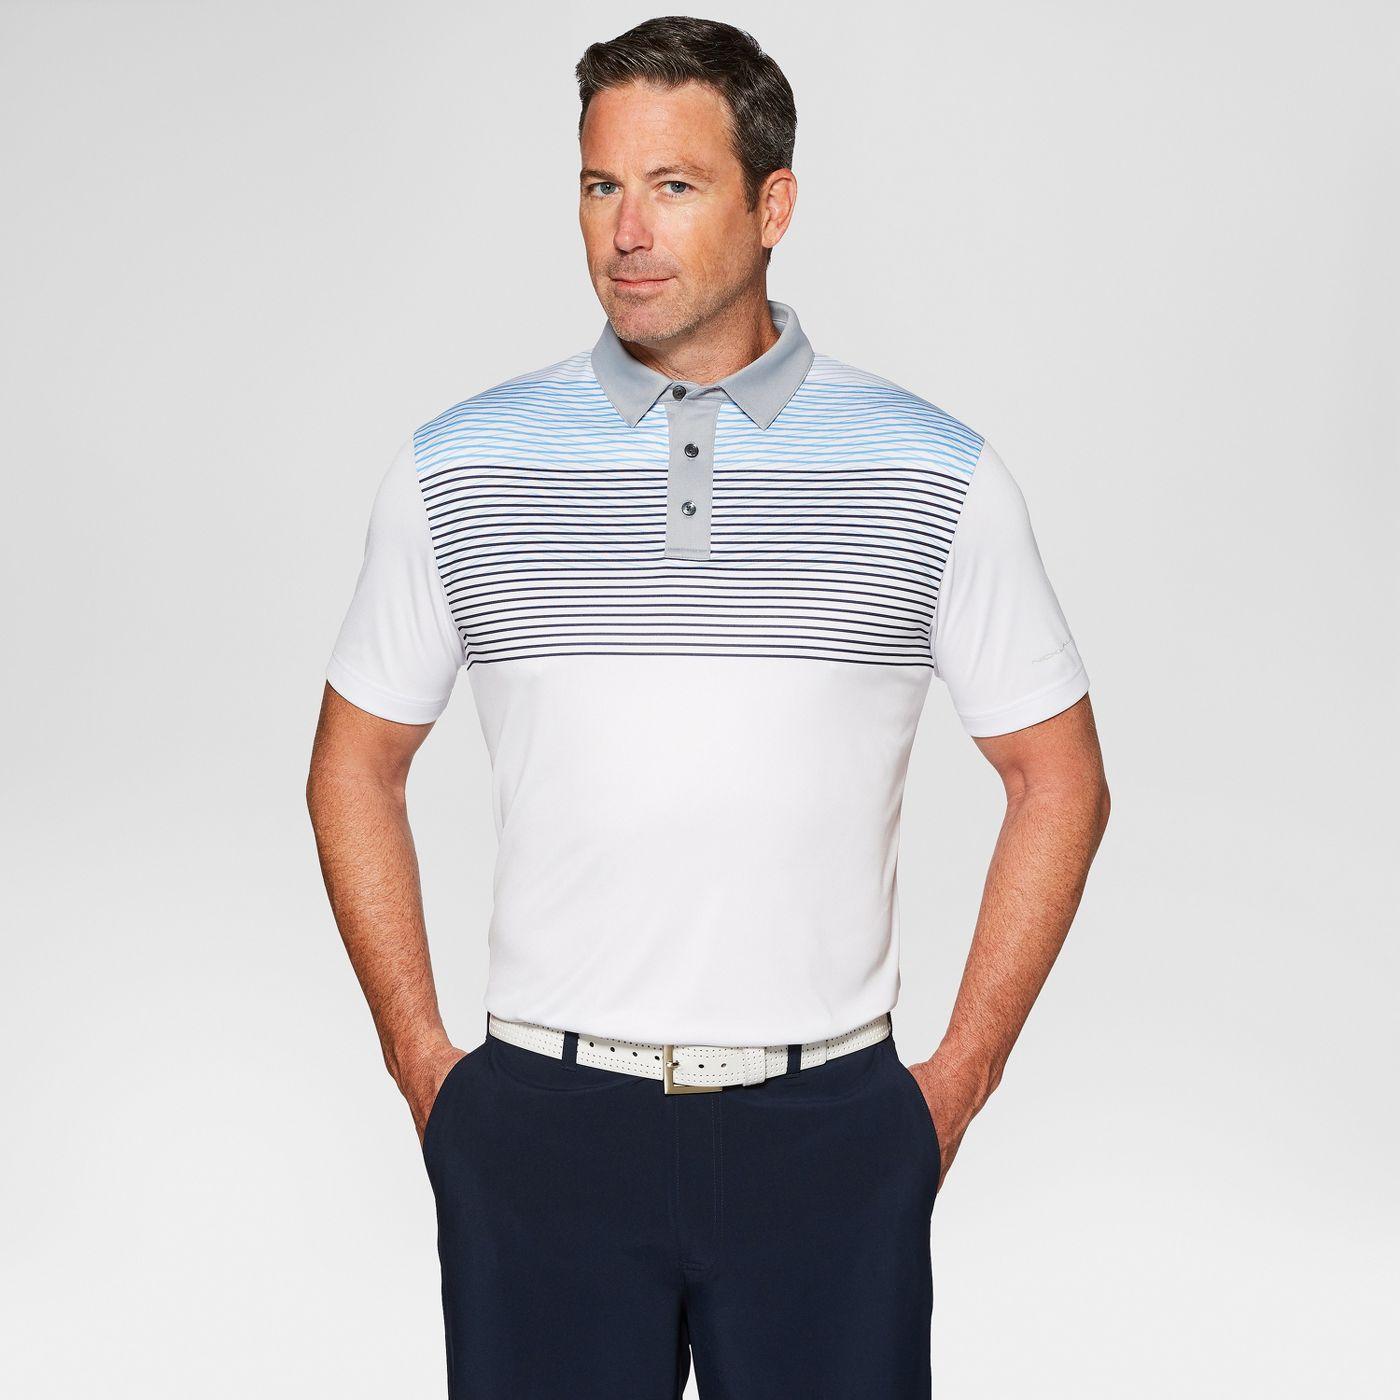 Jack Nicklaus Men's Stripe Golf Polo Shirt (Bright White,Large)